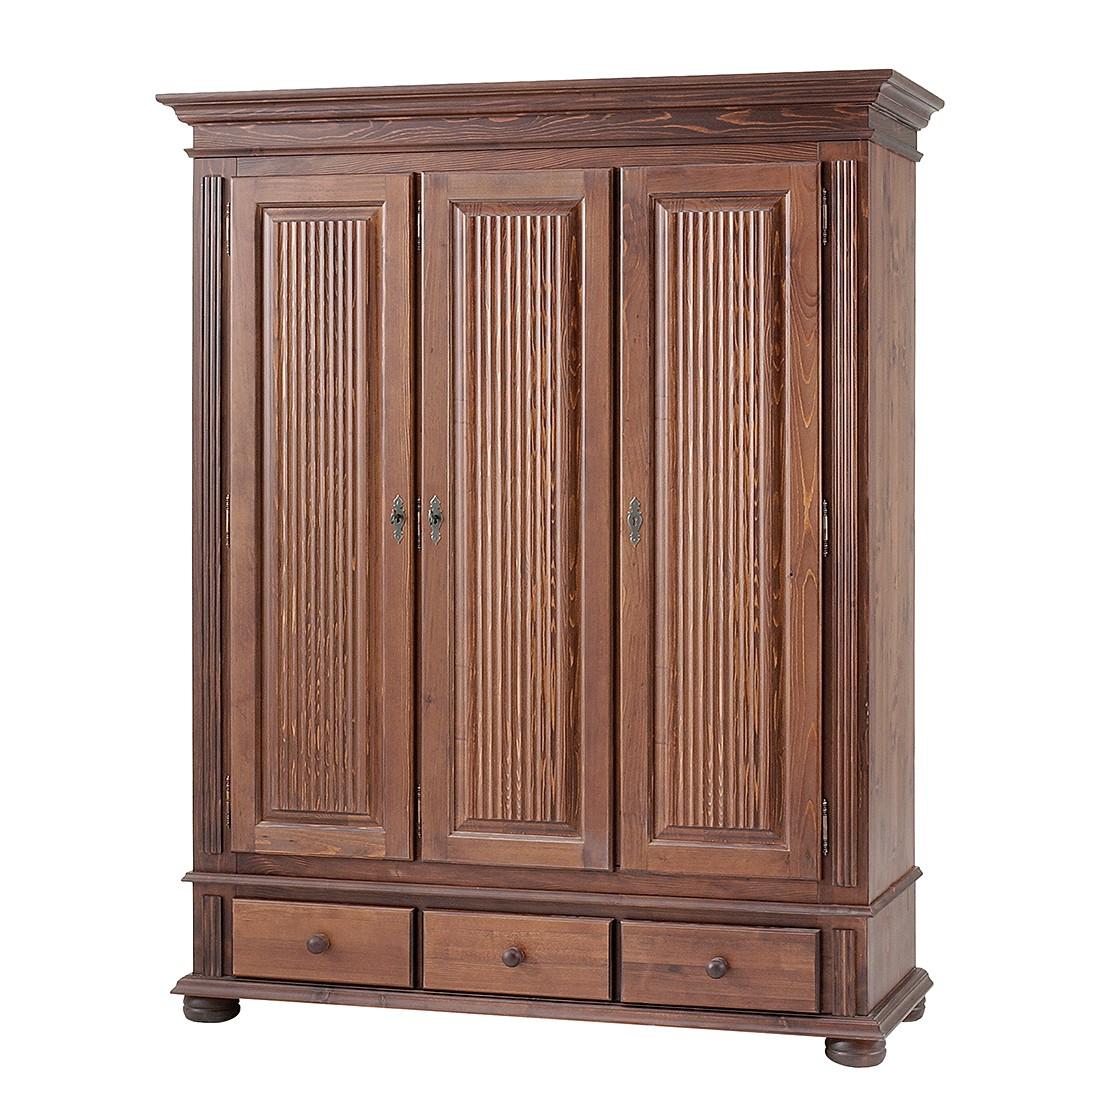 dielenschrank friedrich iii fichte massiv kolonial. Black Bedroom Furniture Sets. Home Design Ideas